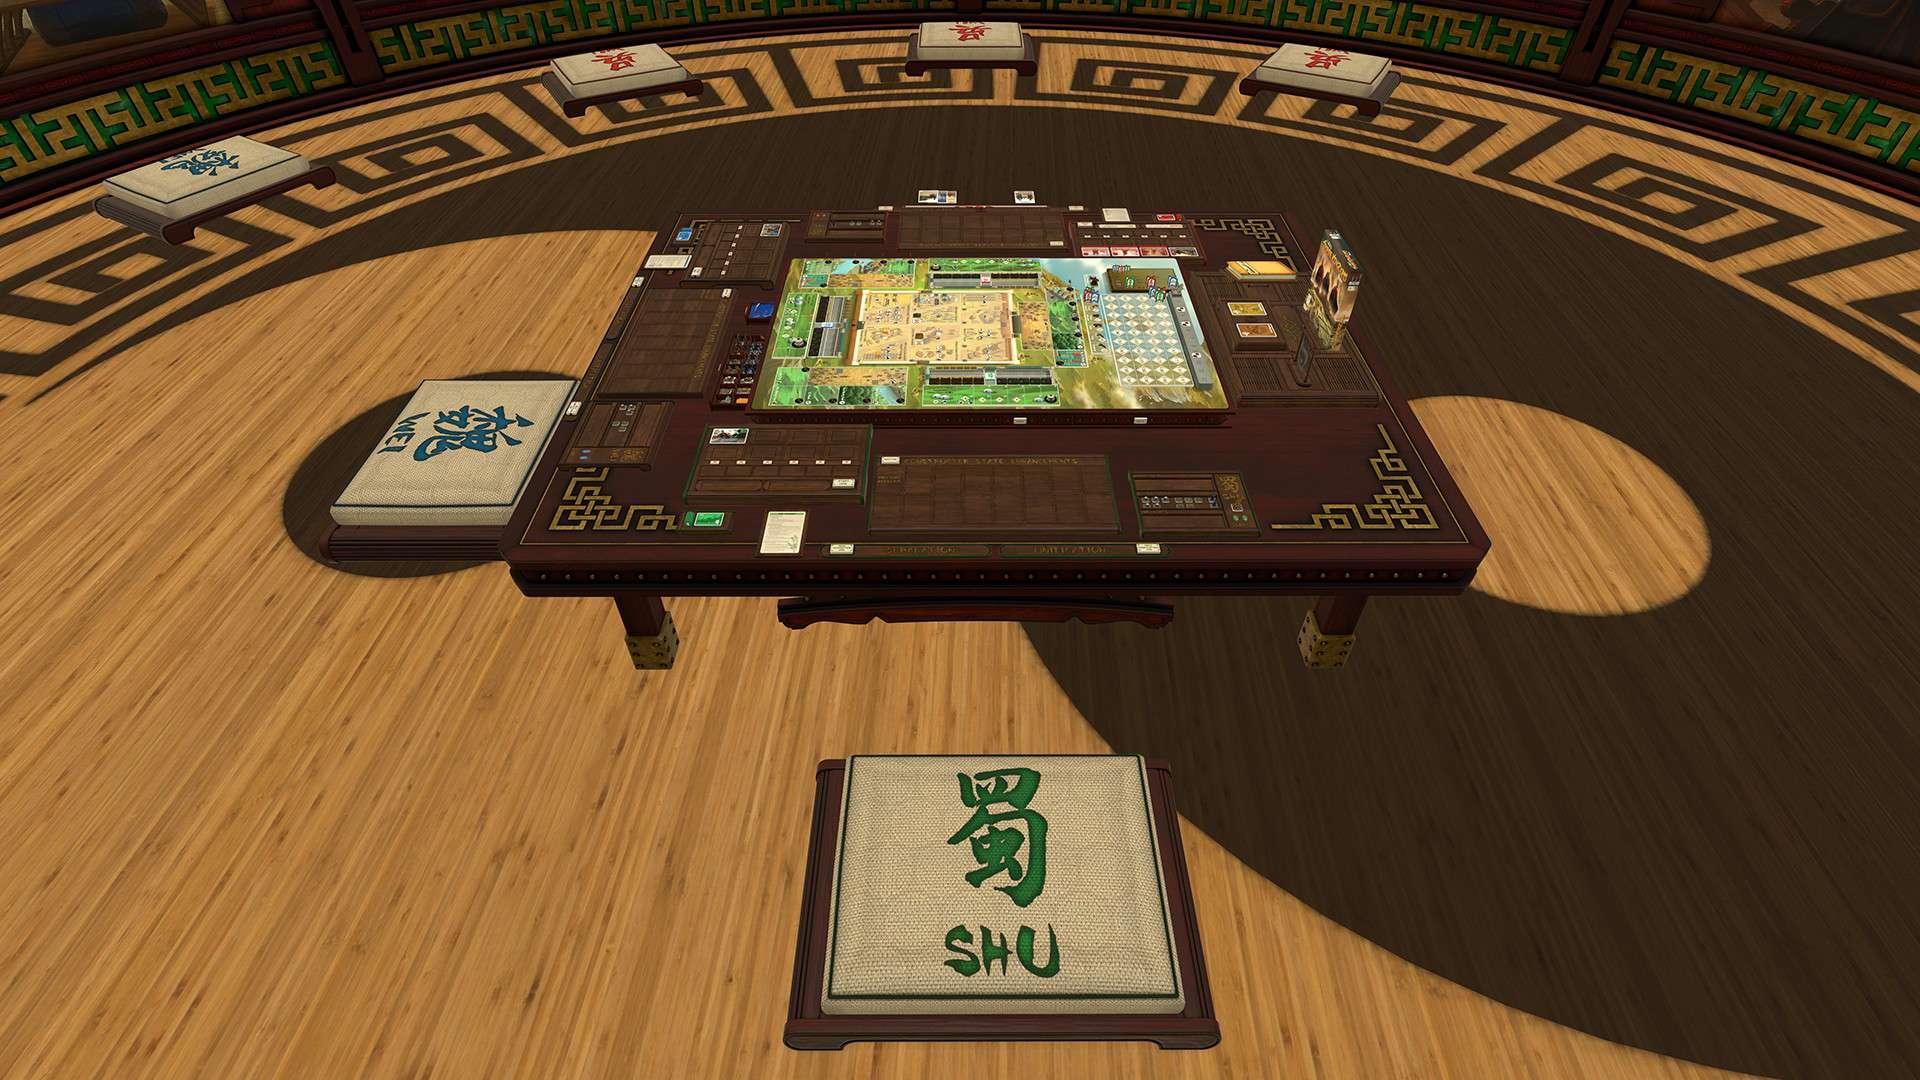 [4Share] Tabletop Simulator Three Kingdoms Redux-PLAZA [Simulator/ISO/2017] | Bam.Vn